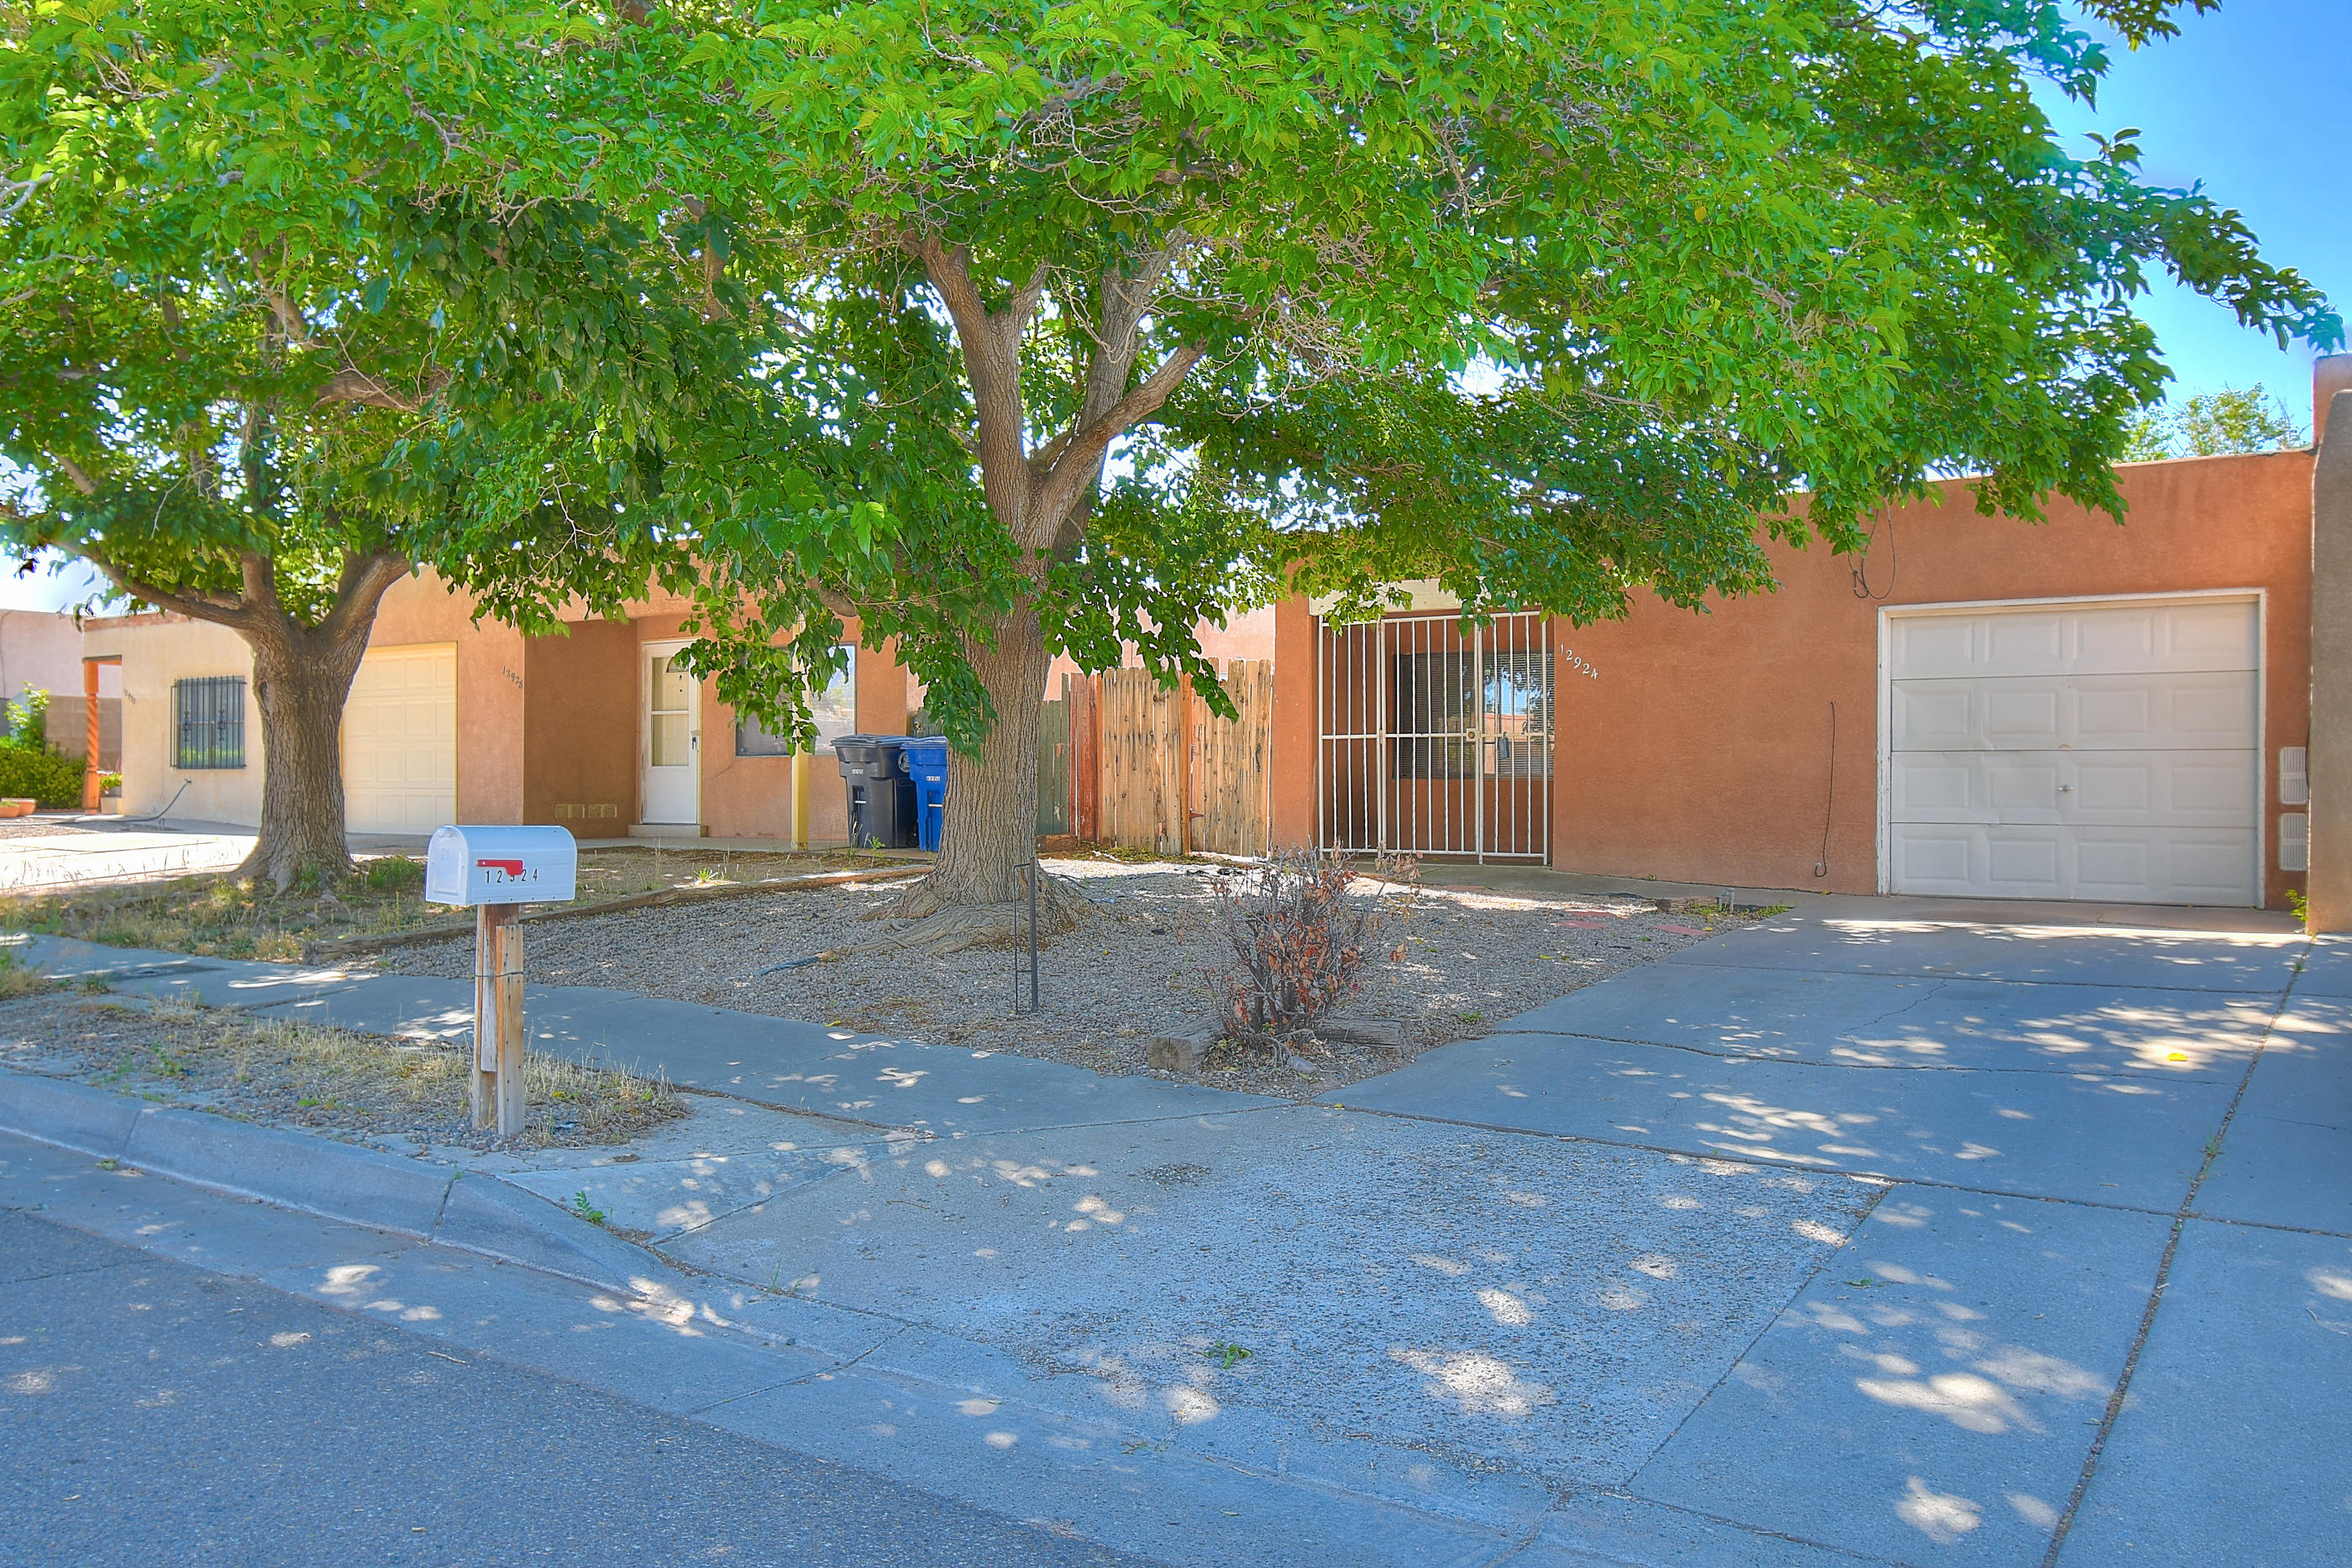 12924 Carrie Place SE, Albuquerque, NM 87123-3804